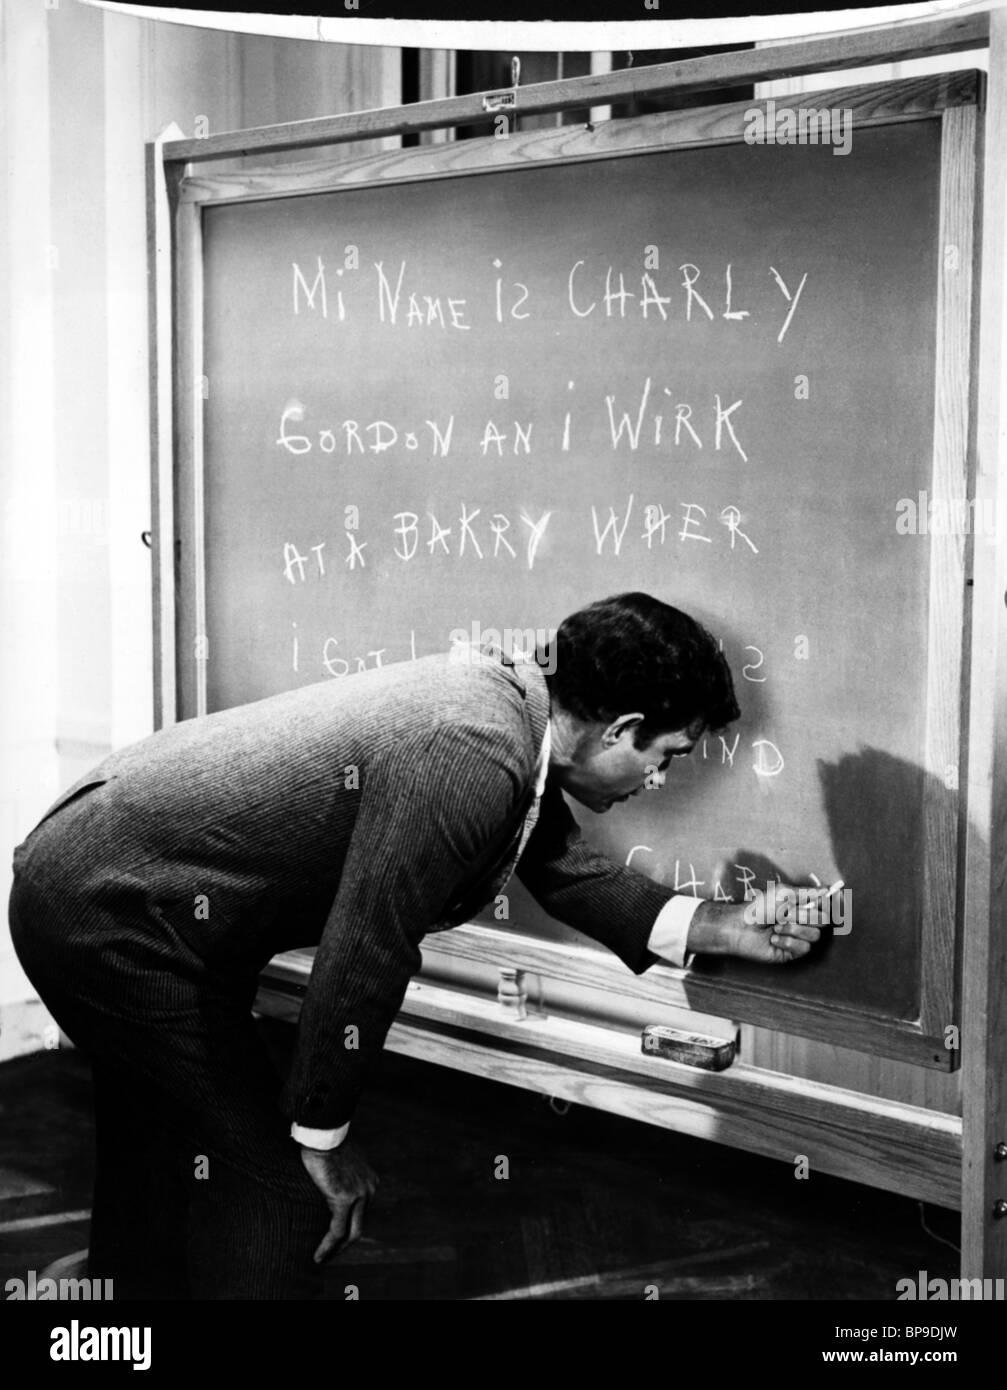 CLIFF ROBERTSON CHARLY (1968 Stock Photo 30941089 , Alamy